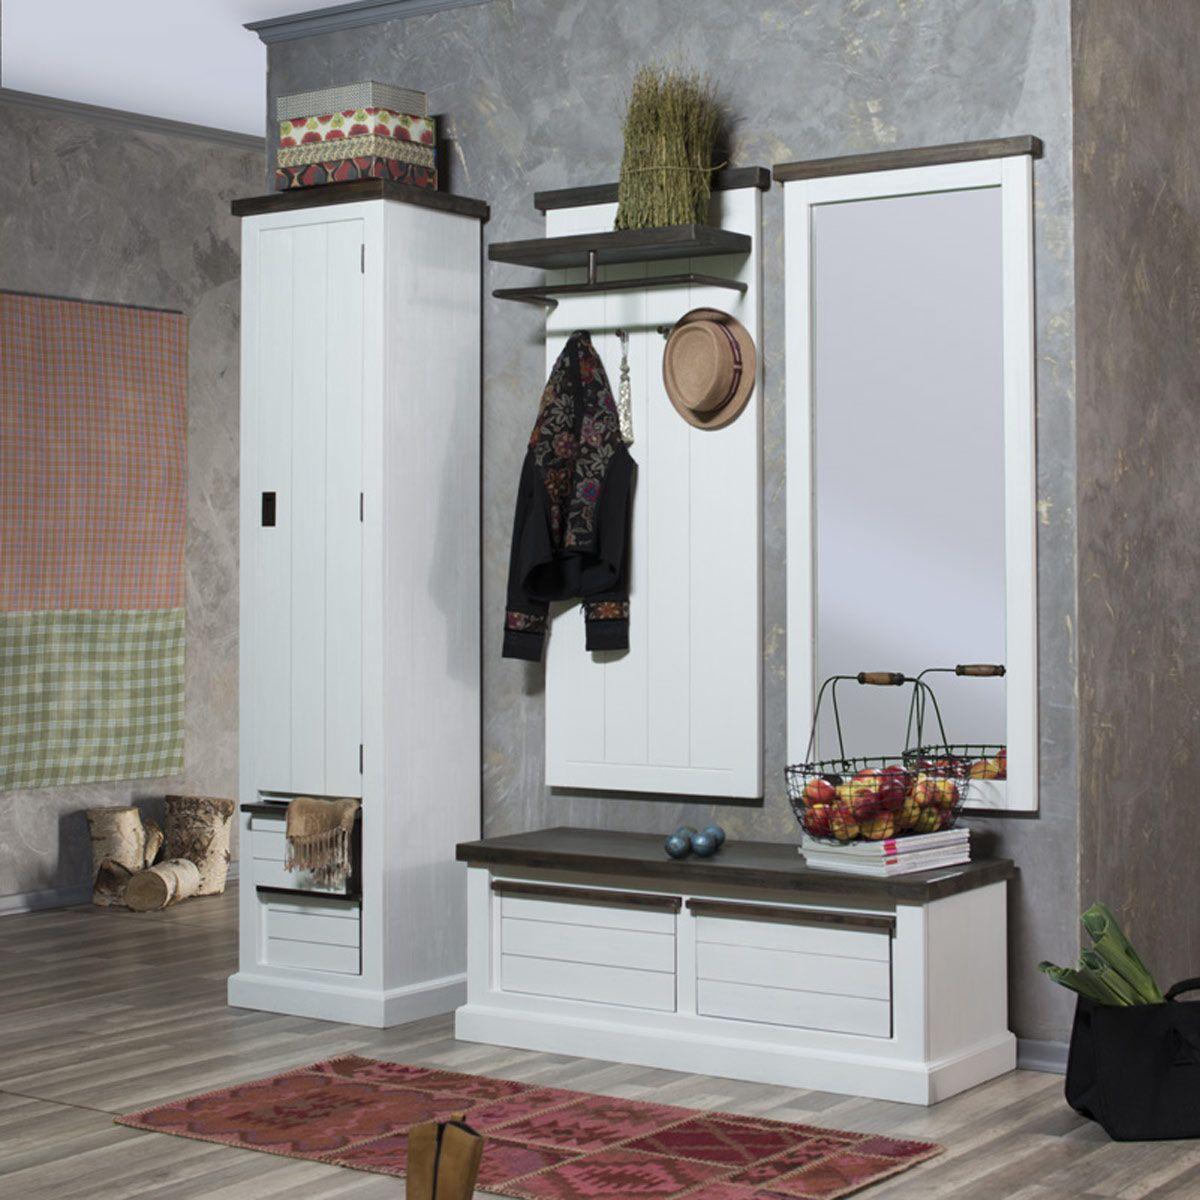 Massivholz Mobel Online Kaufen Garderoben Set Garderobe